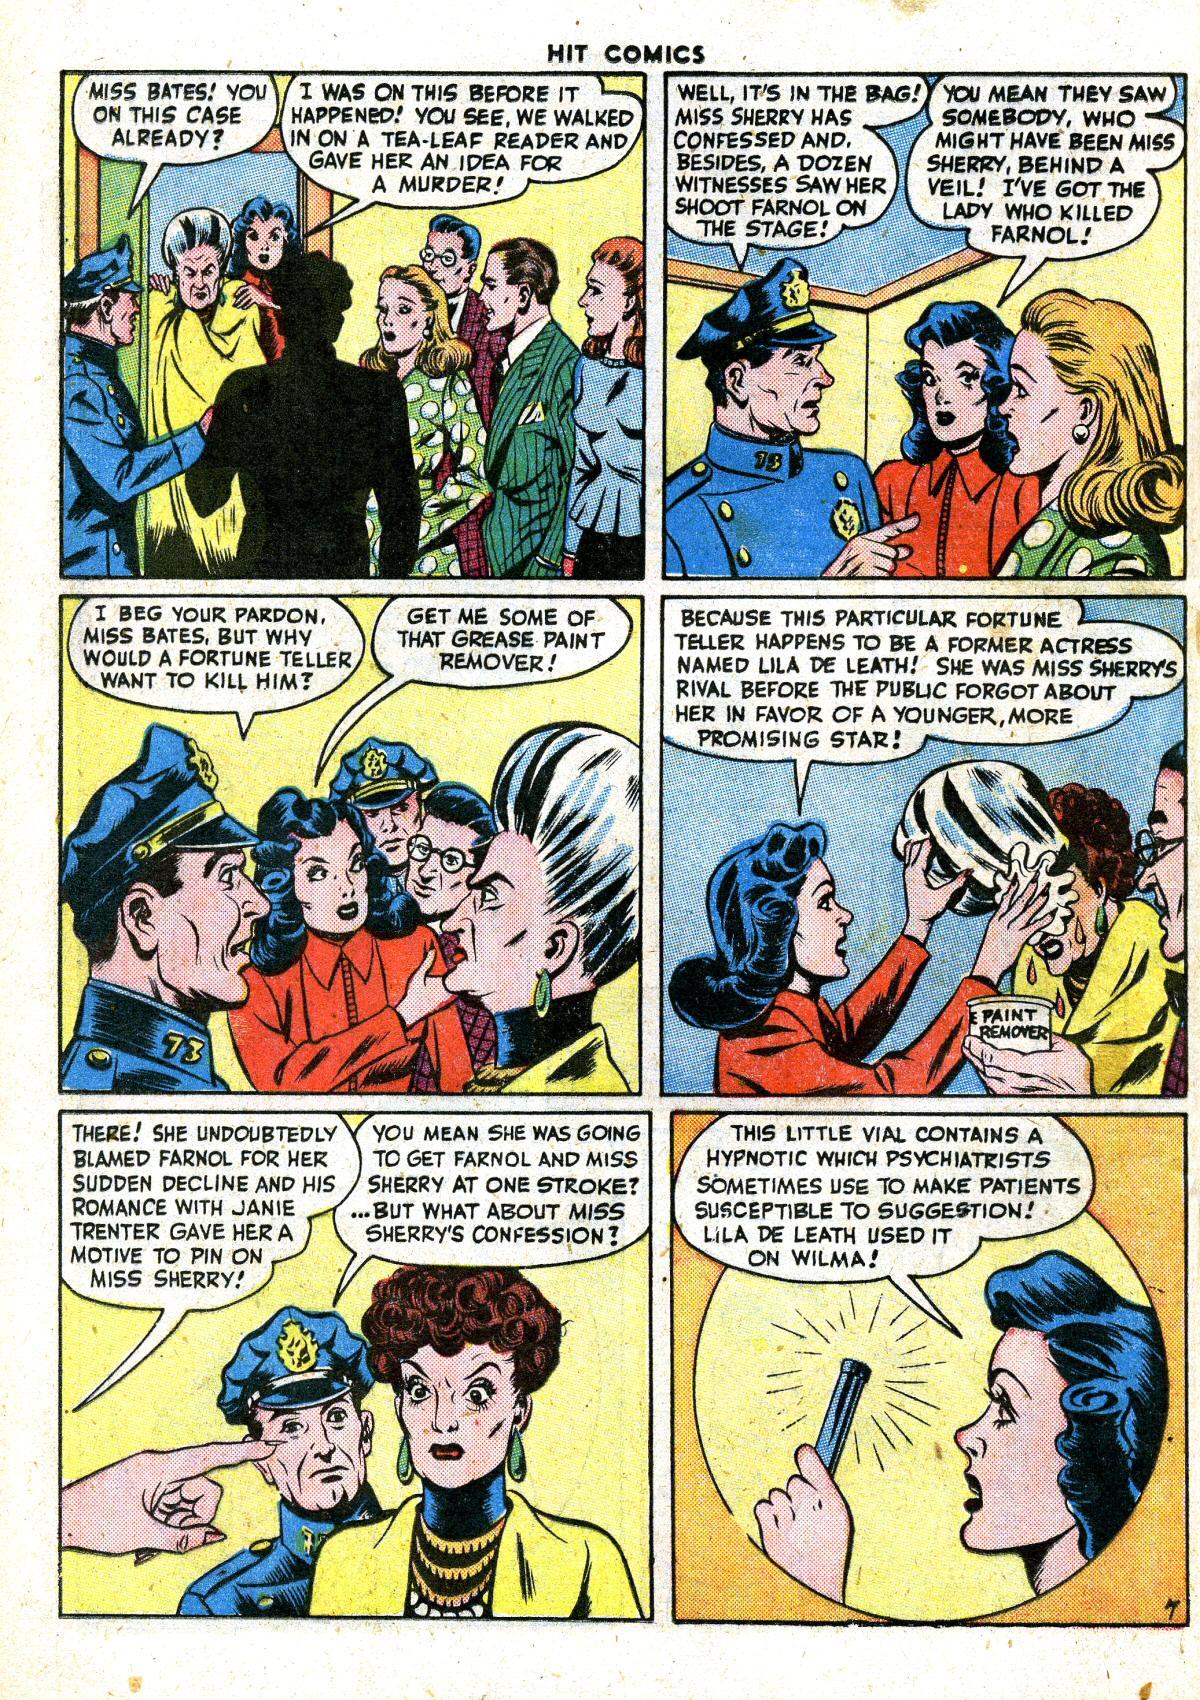 Read online Hit Comics comic -  Issue #41 - 36